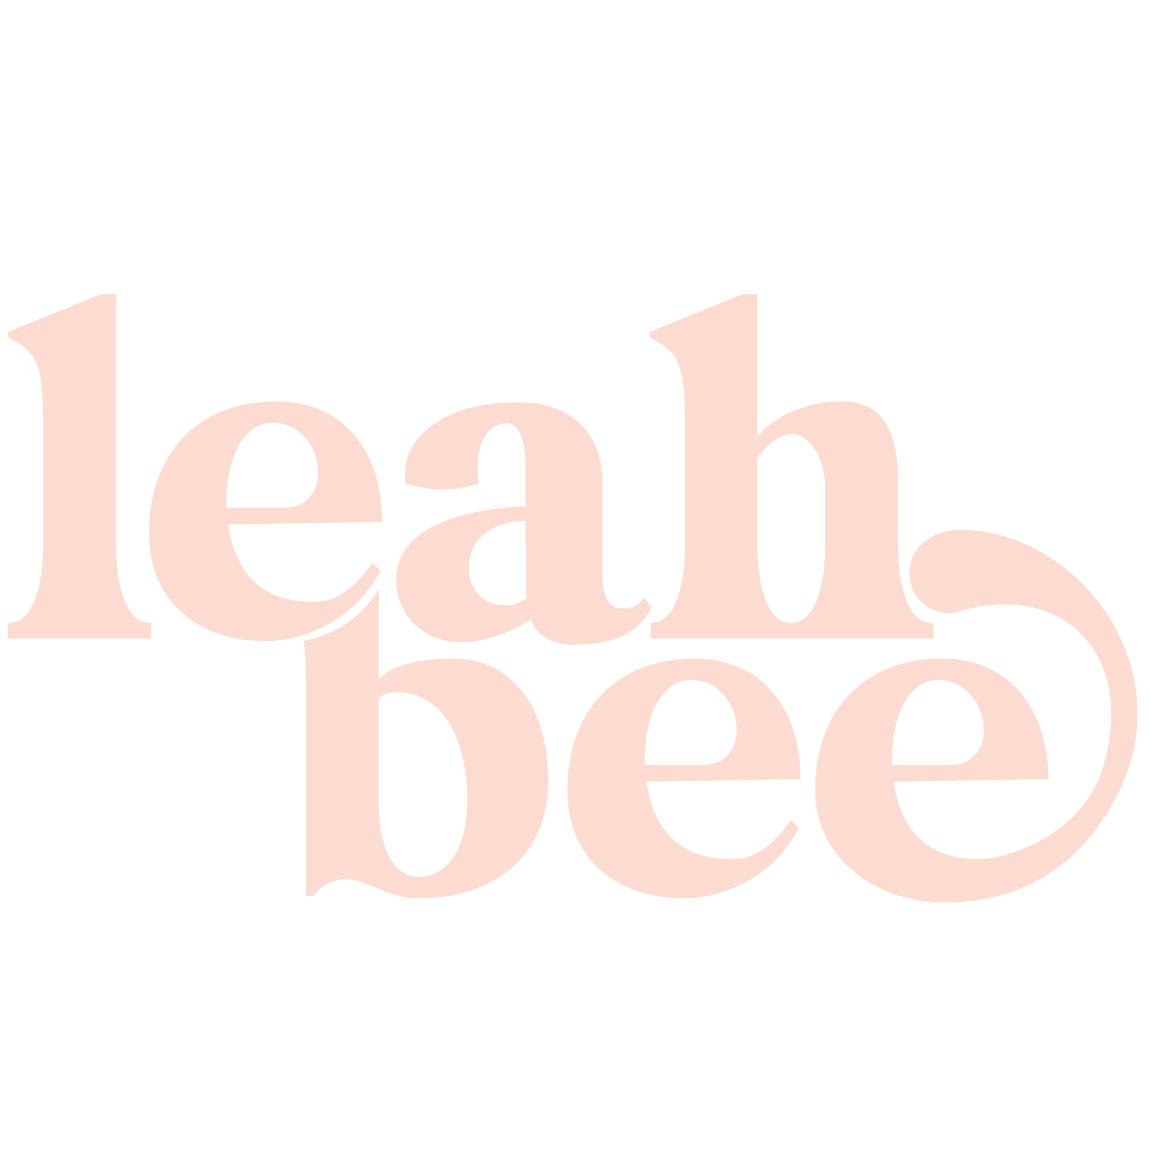 Leah Beecham